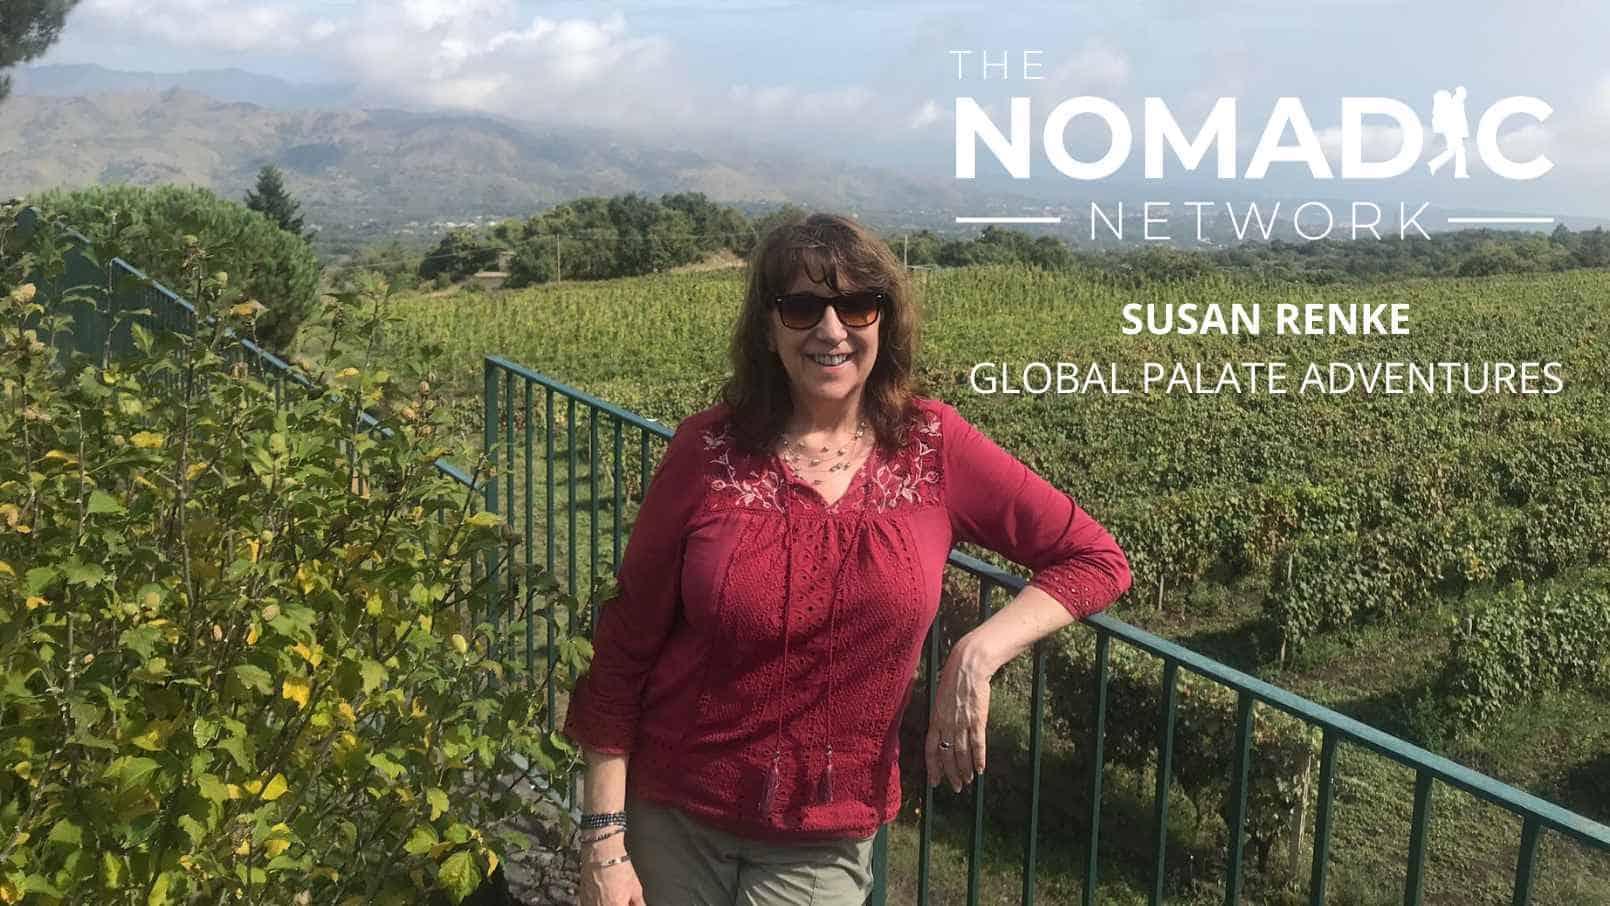 Solo female traveler posing in a vineyard